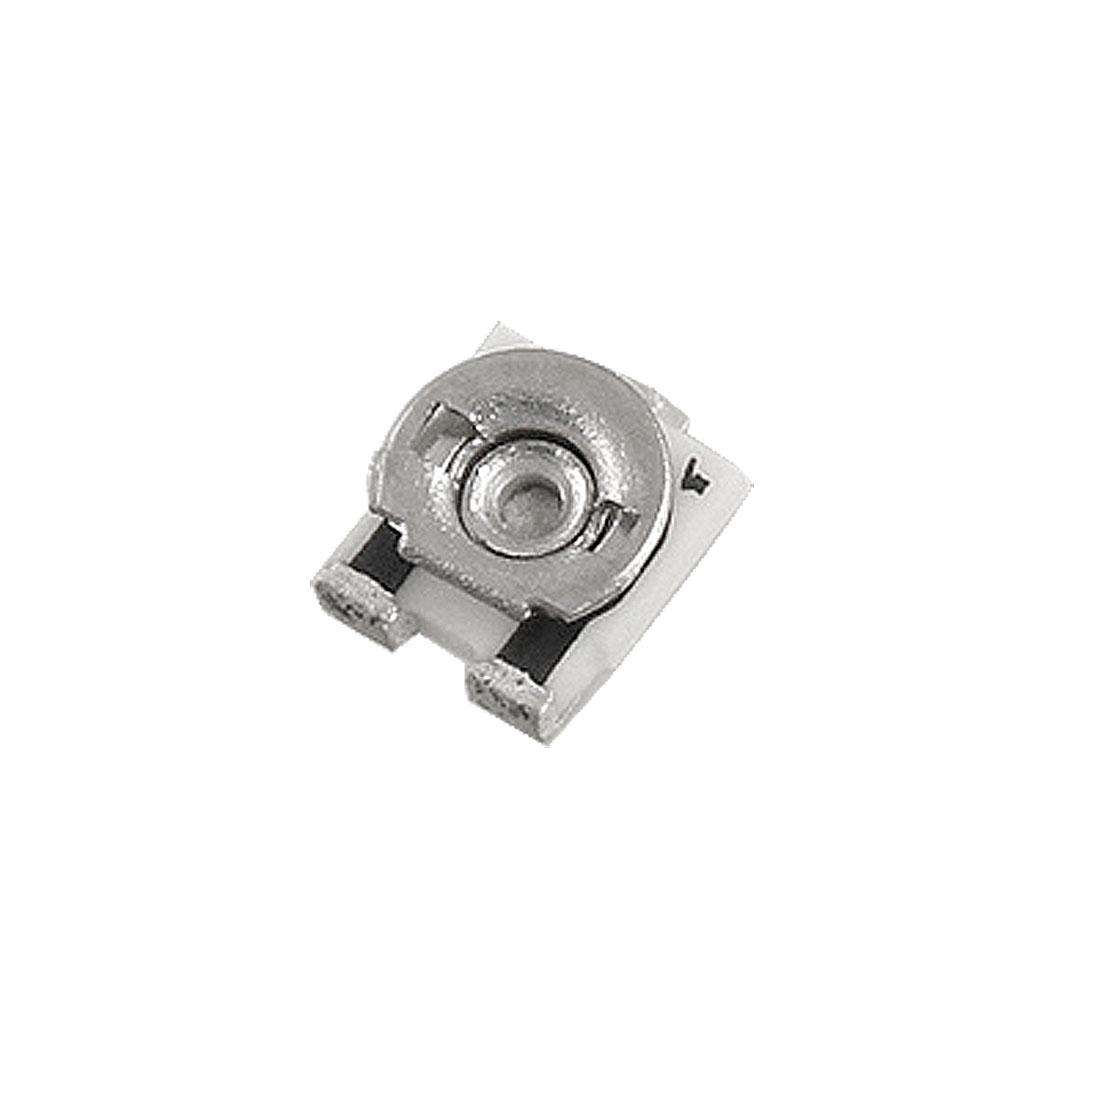 100 Pcs SMD Trimmer Potentiometer Variable Resistor 33K ohm